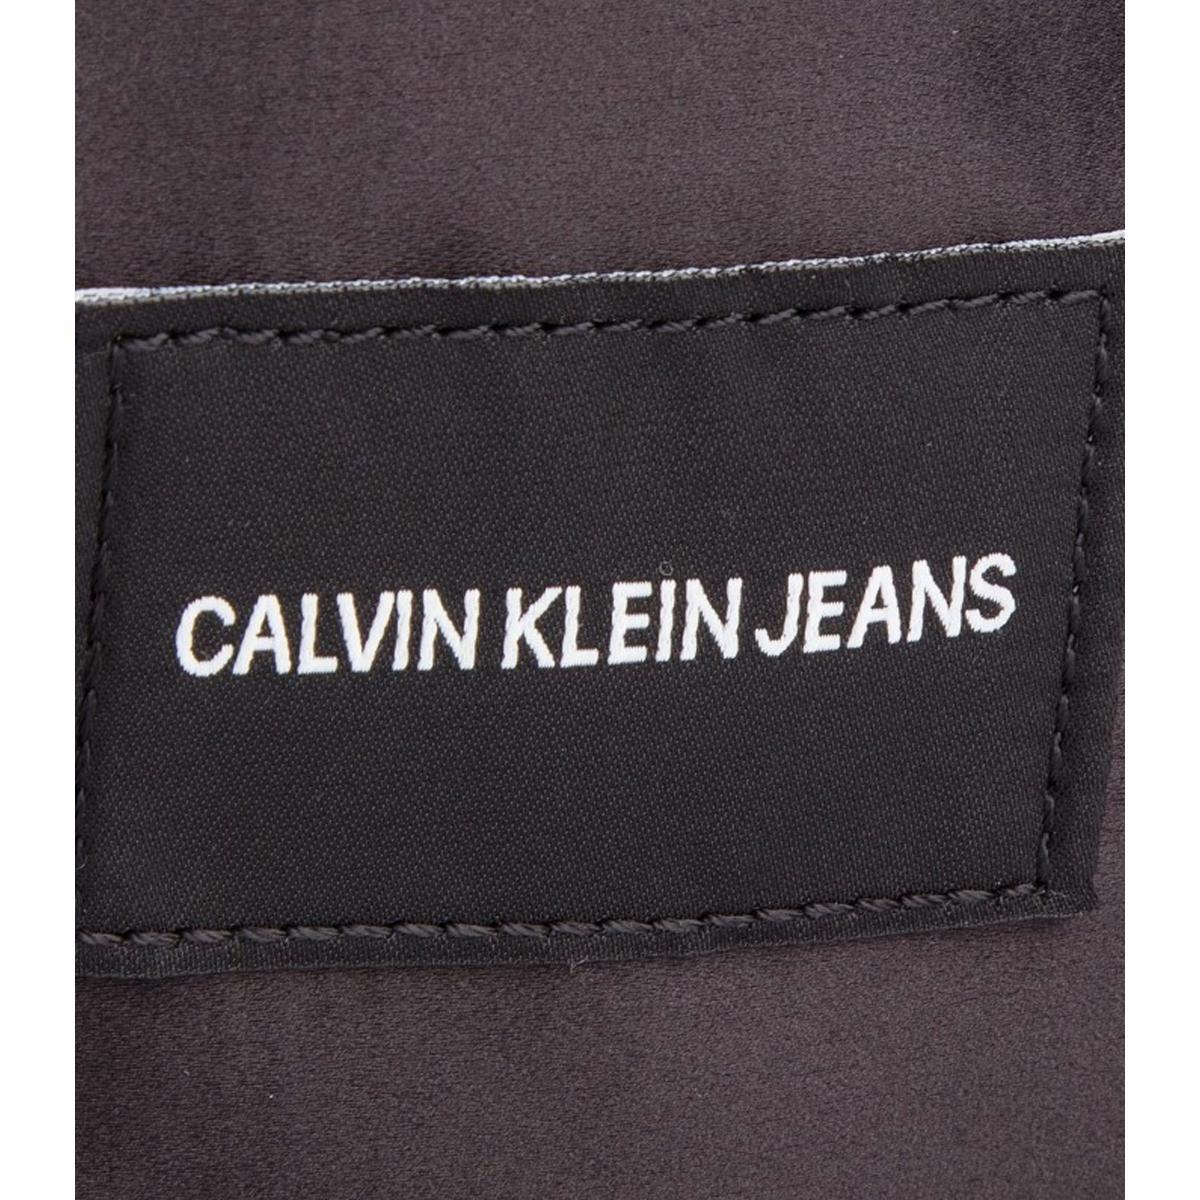 Zaino Calvin Klein Jeans in nylon imbottito unisex rif. K40K400824